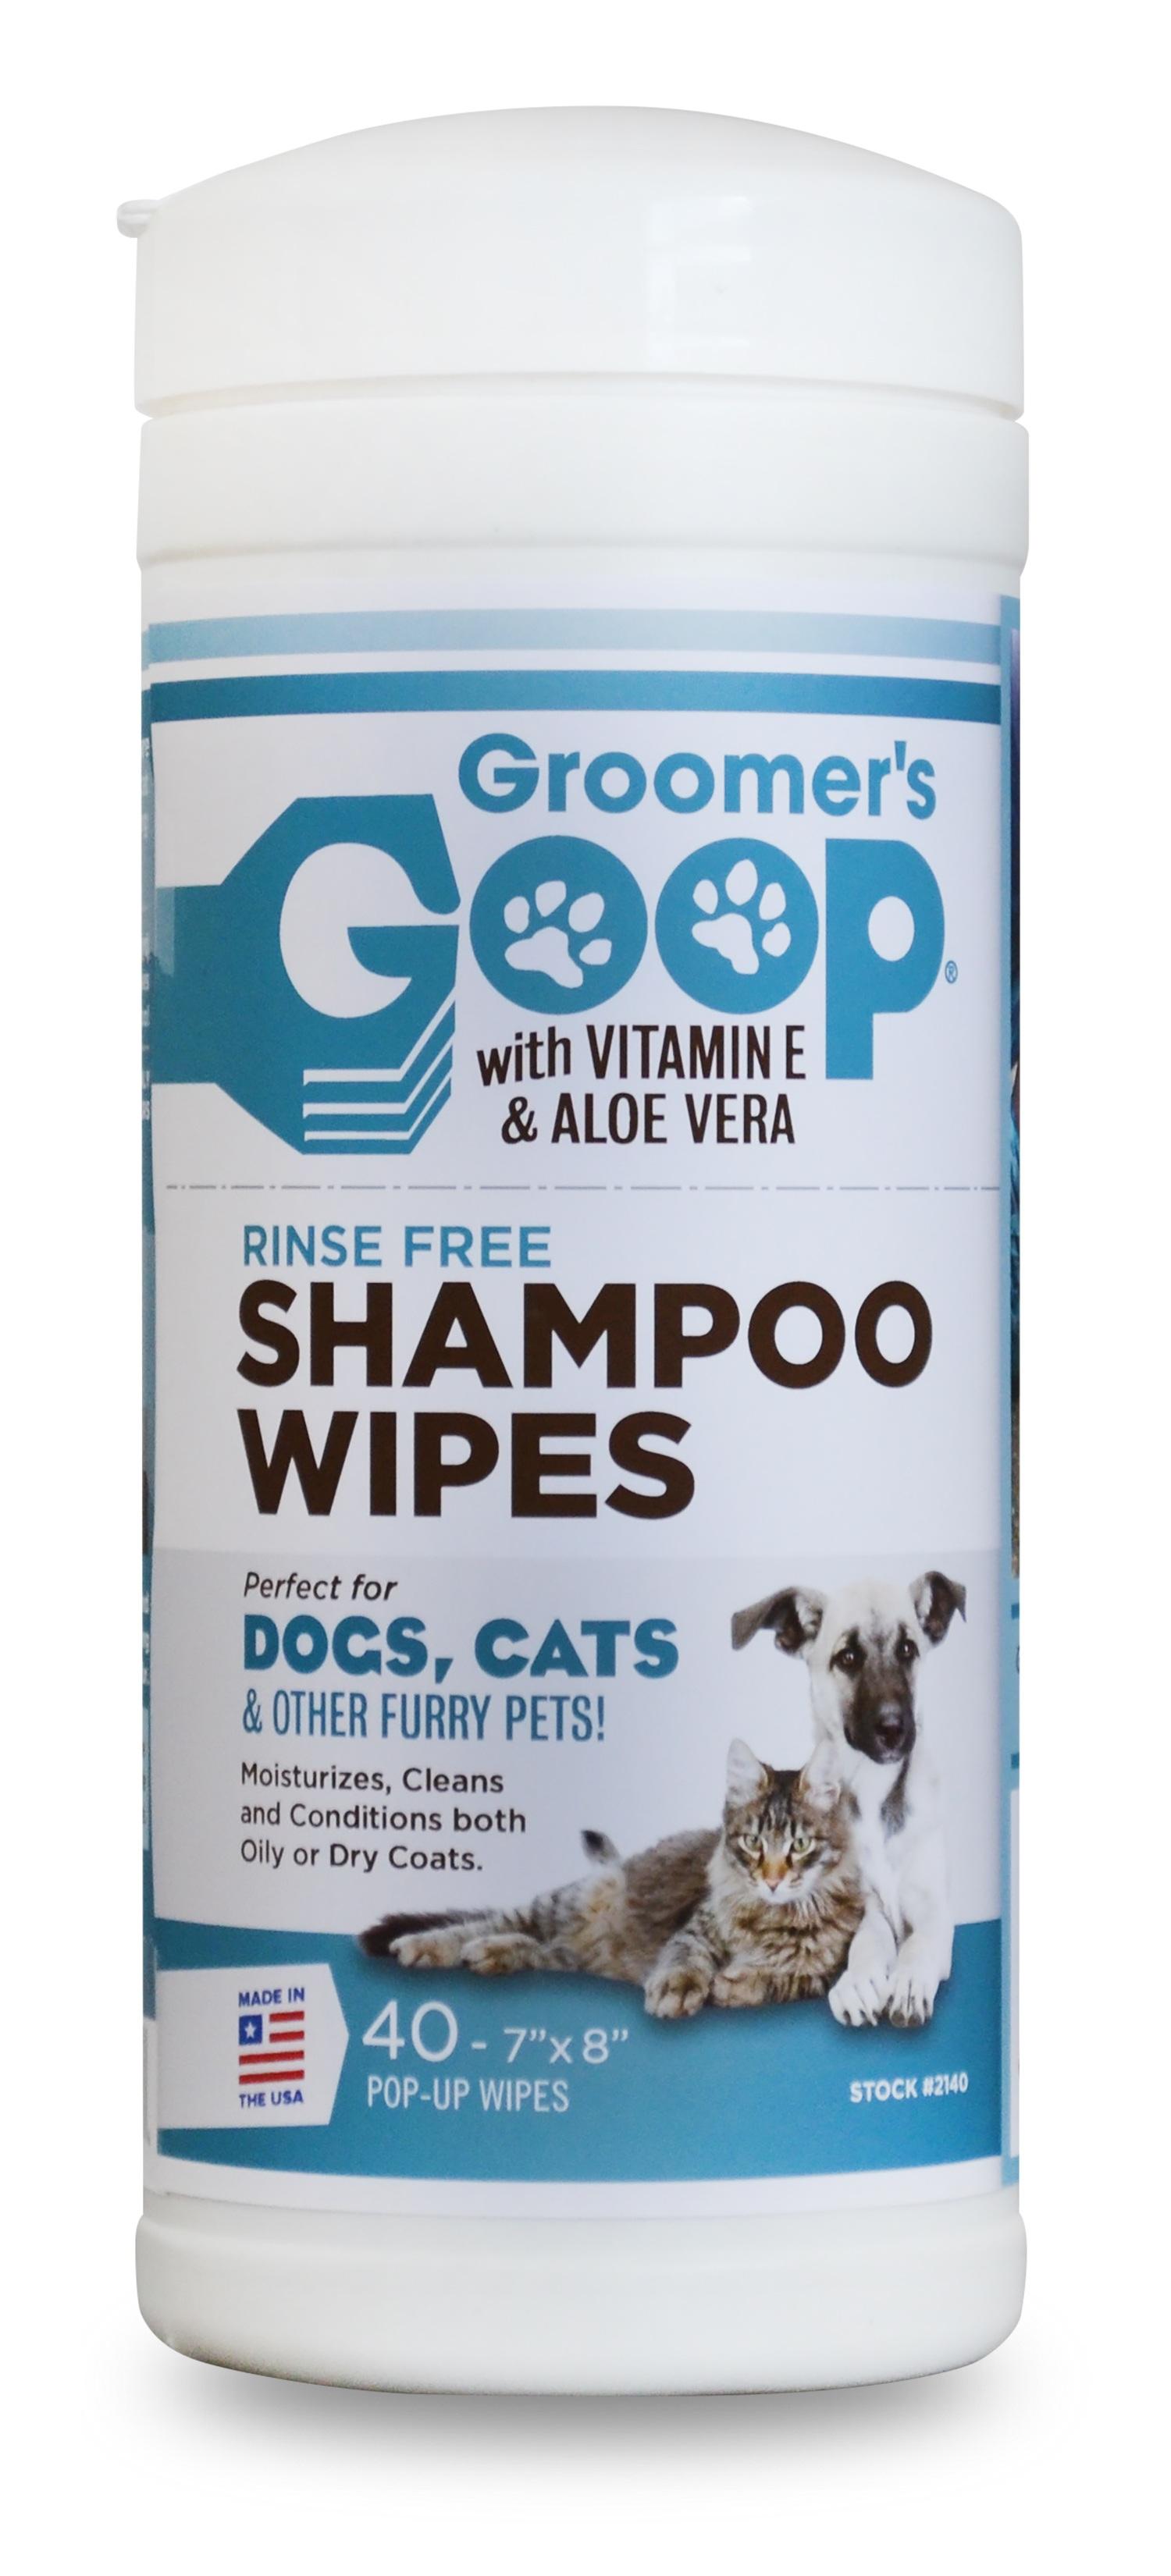 "Groomer's Goop Shampoo Wipes- 40, 7"" x 8"" Pop-up Wipes"